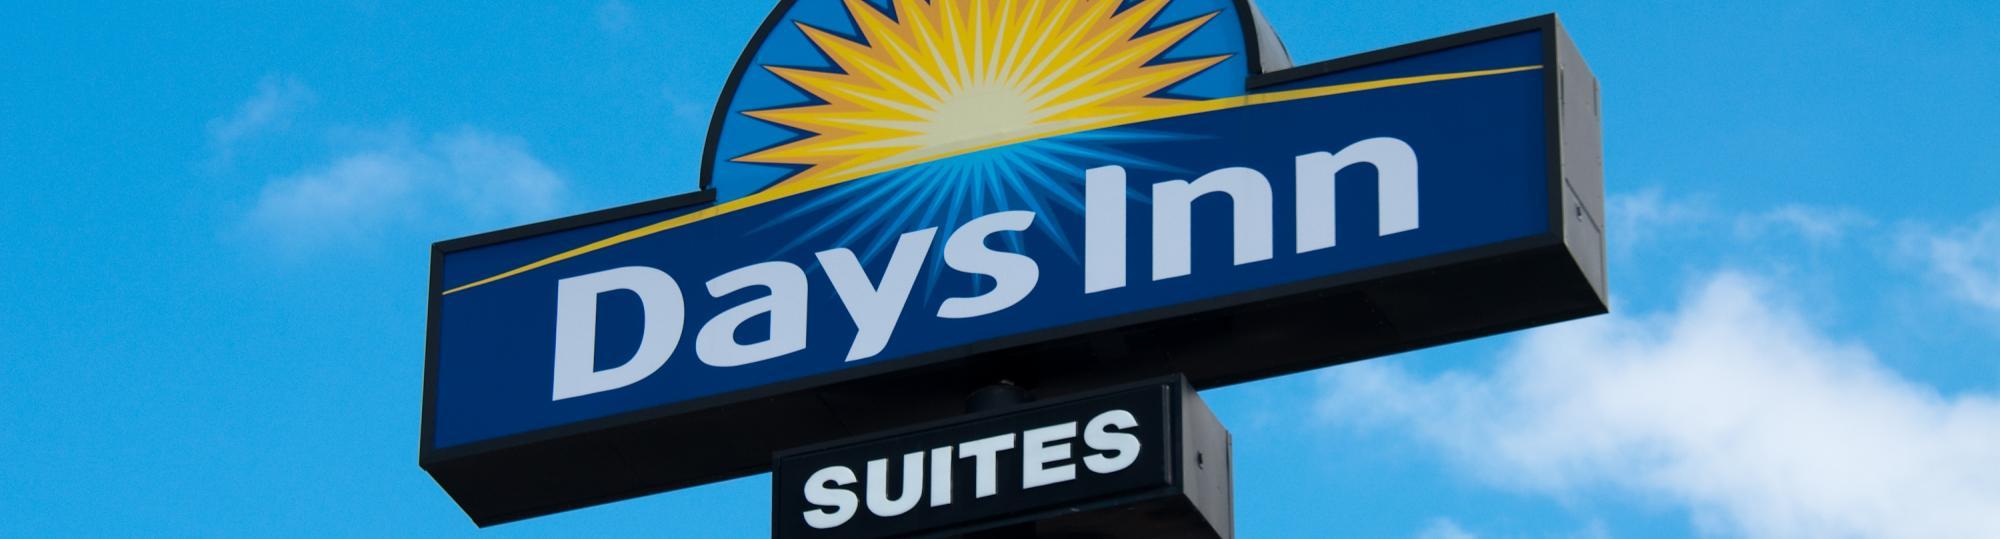 Days Inn Military Discounts with Veterans Advantage